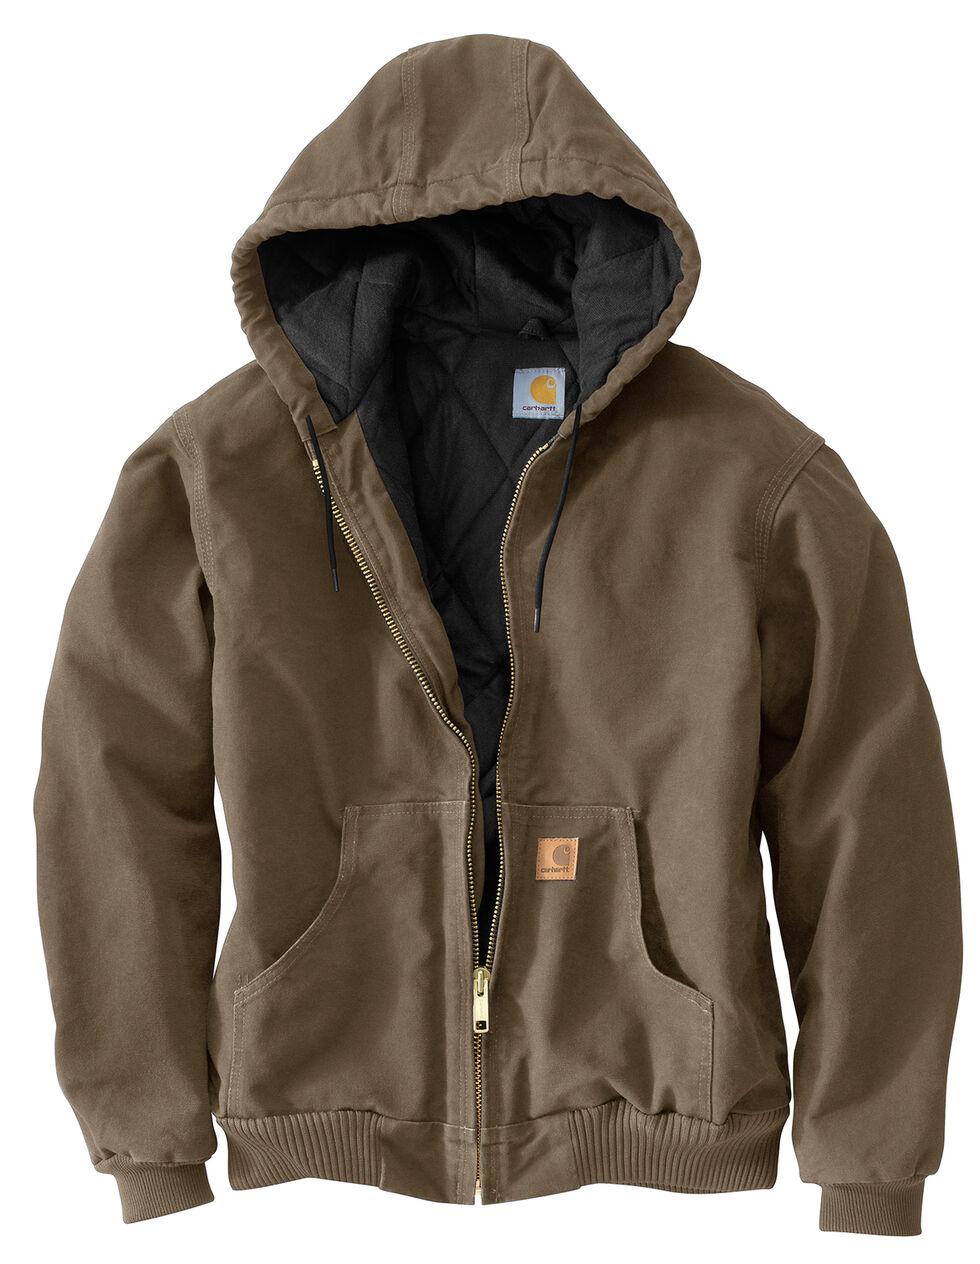 Carhartt Men's Sandstone Flannel Lined Active Jacket - Big & Tall, Light Brown, hi-res